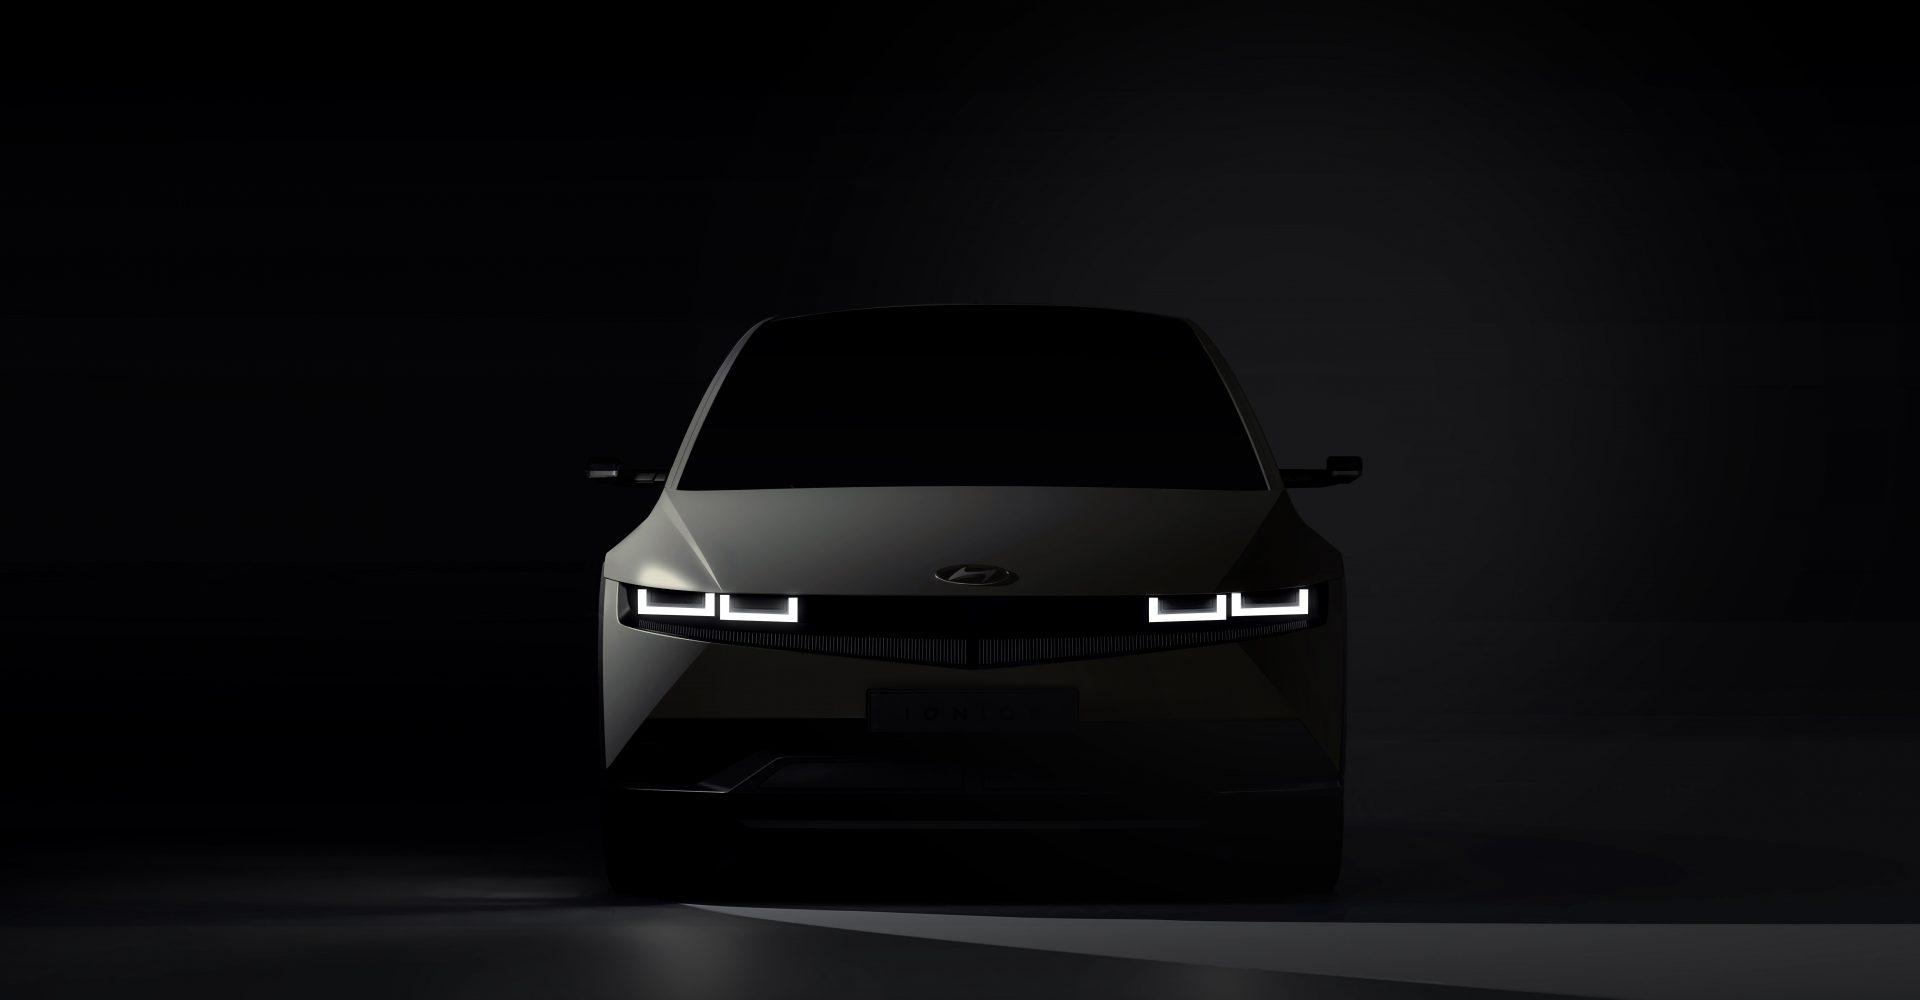 Hyundai gives first glimpse of Ioniq 5 EV